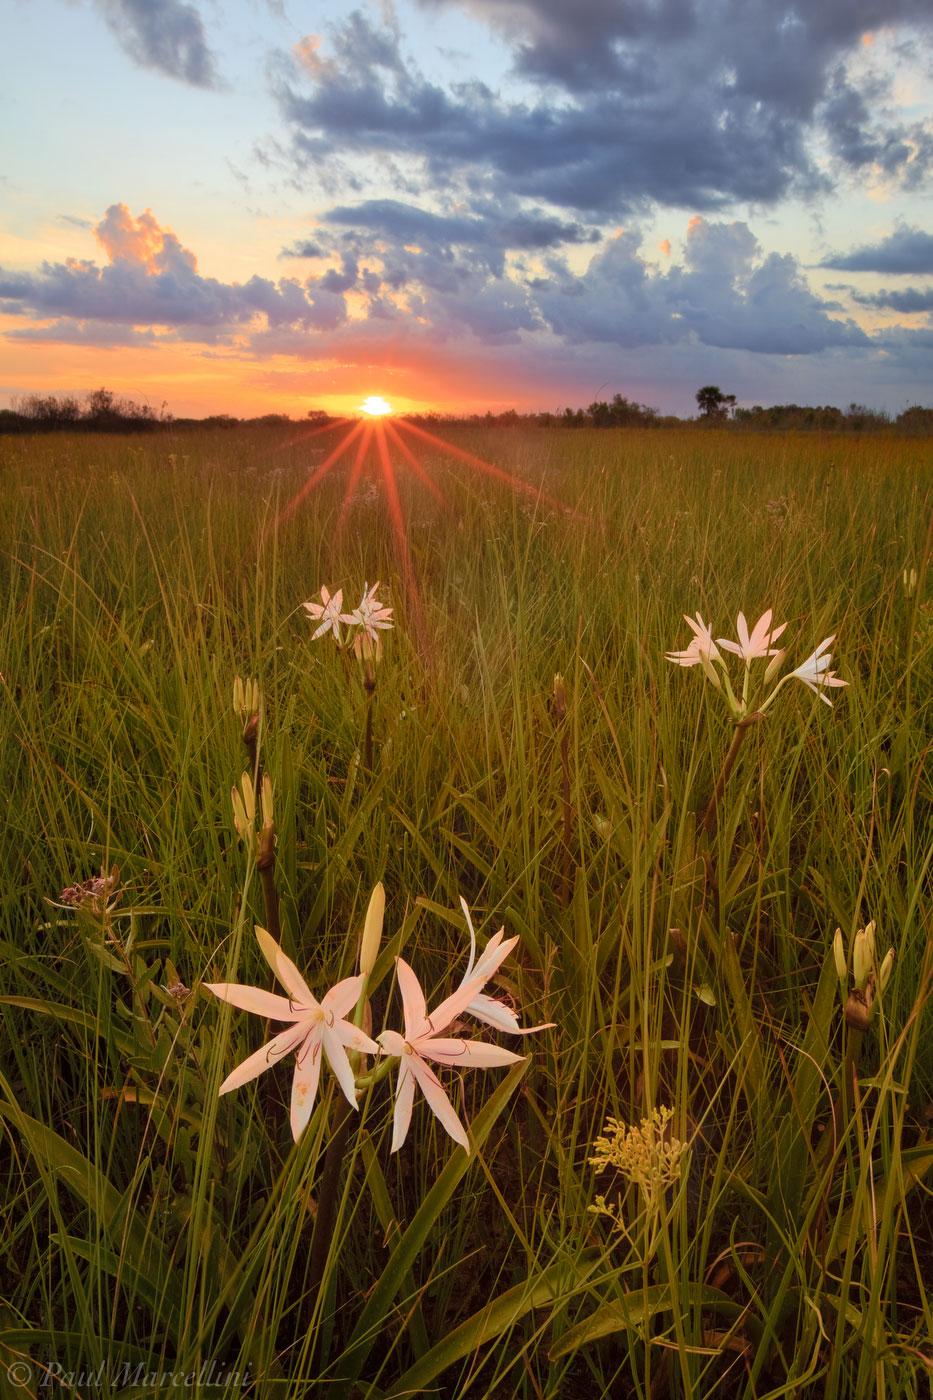 everglades, lilies, crinum americanum, Florida, nature, photography, florida national parks, photo